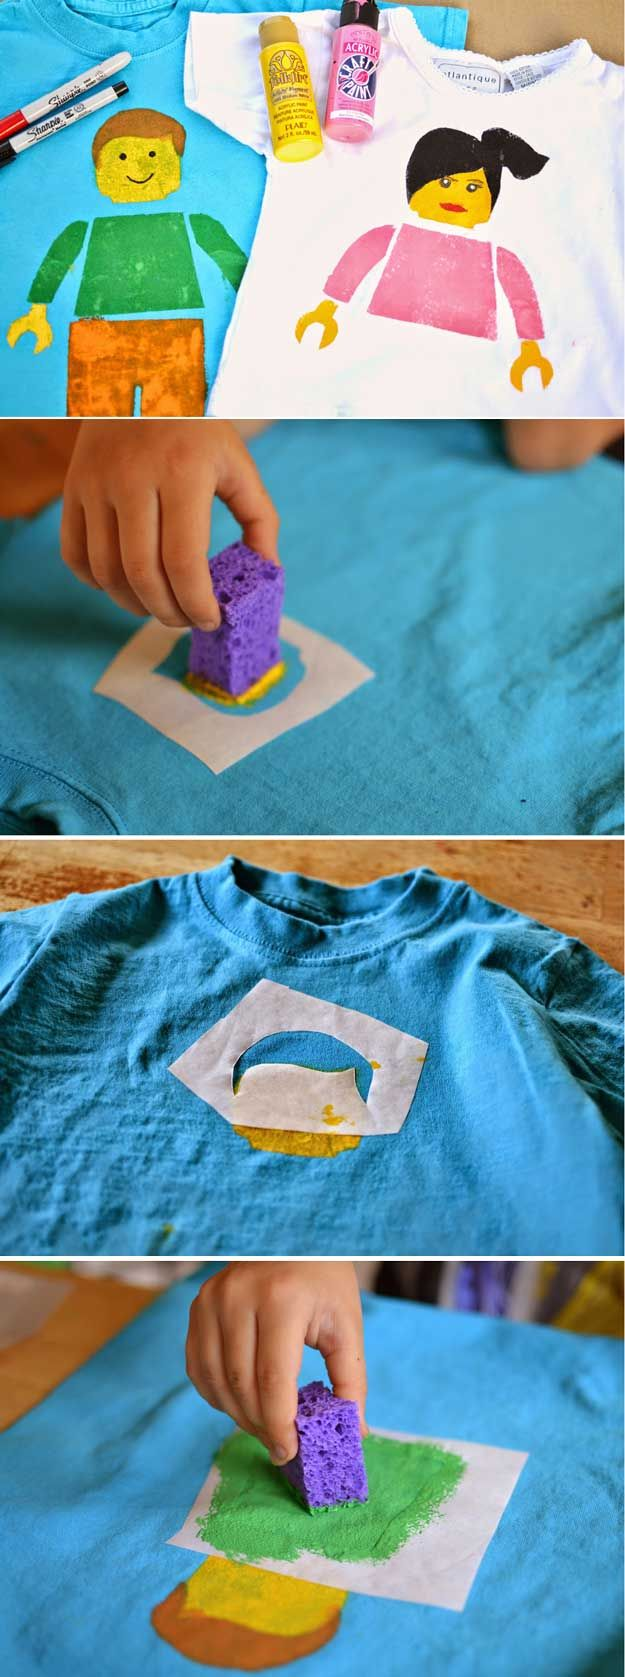 DIY Lego Craft Inspiration | Cute And Creative Crafts by DIY Ready at http://diyready.com/11-fun-diy-lego-crafts-to-make/